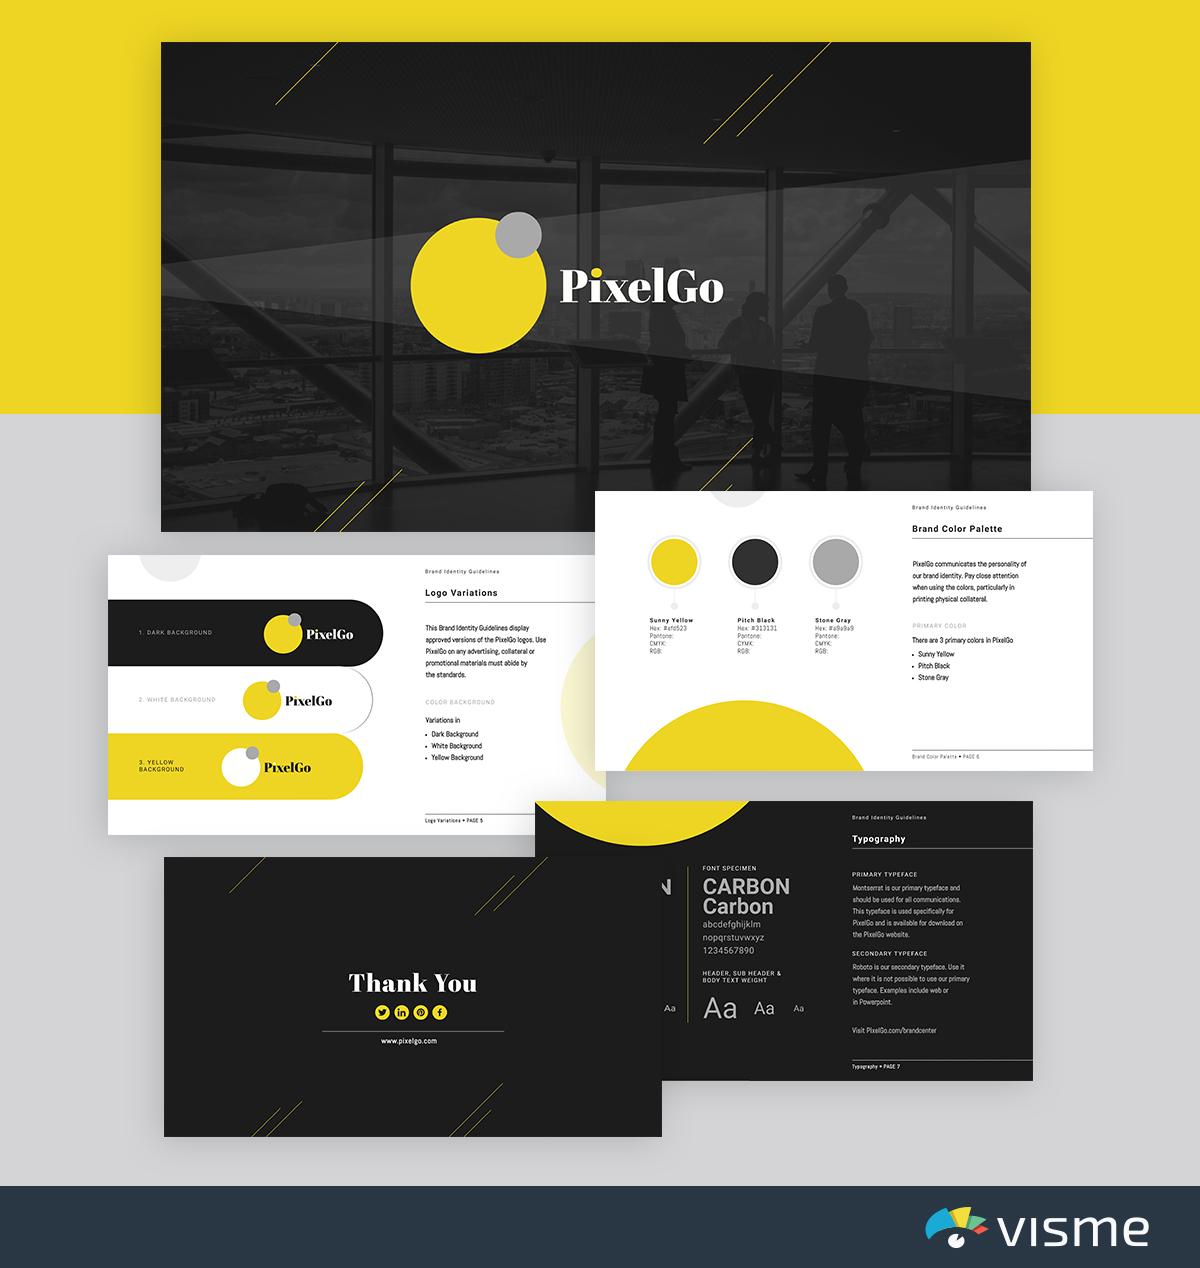 best presentation templates - pixelgo brand-identity-visme